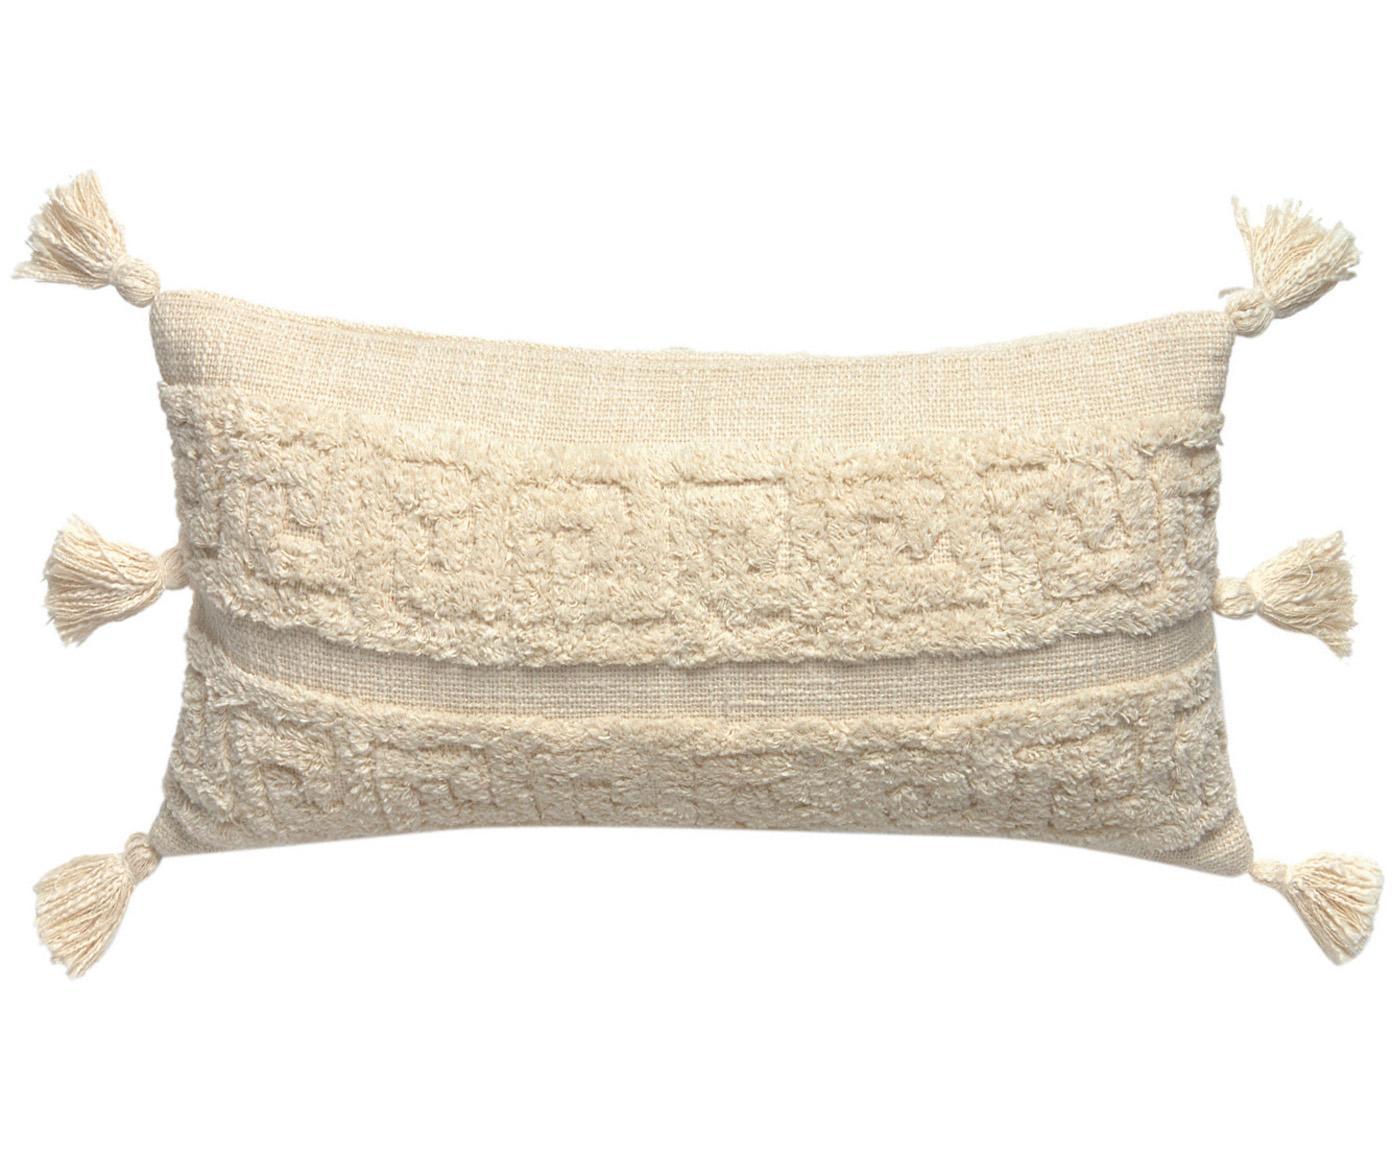 Boho kussenhoes Hera met hoog-laag patroon en kwastjes, 100% katoen, Crèmekleurig, 30 x 60 cm